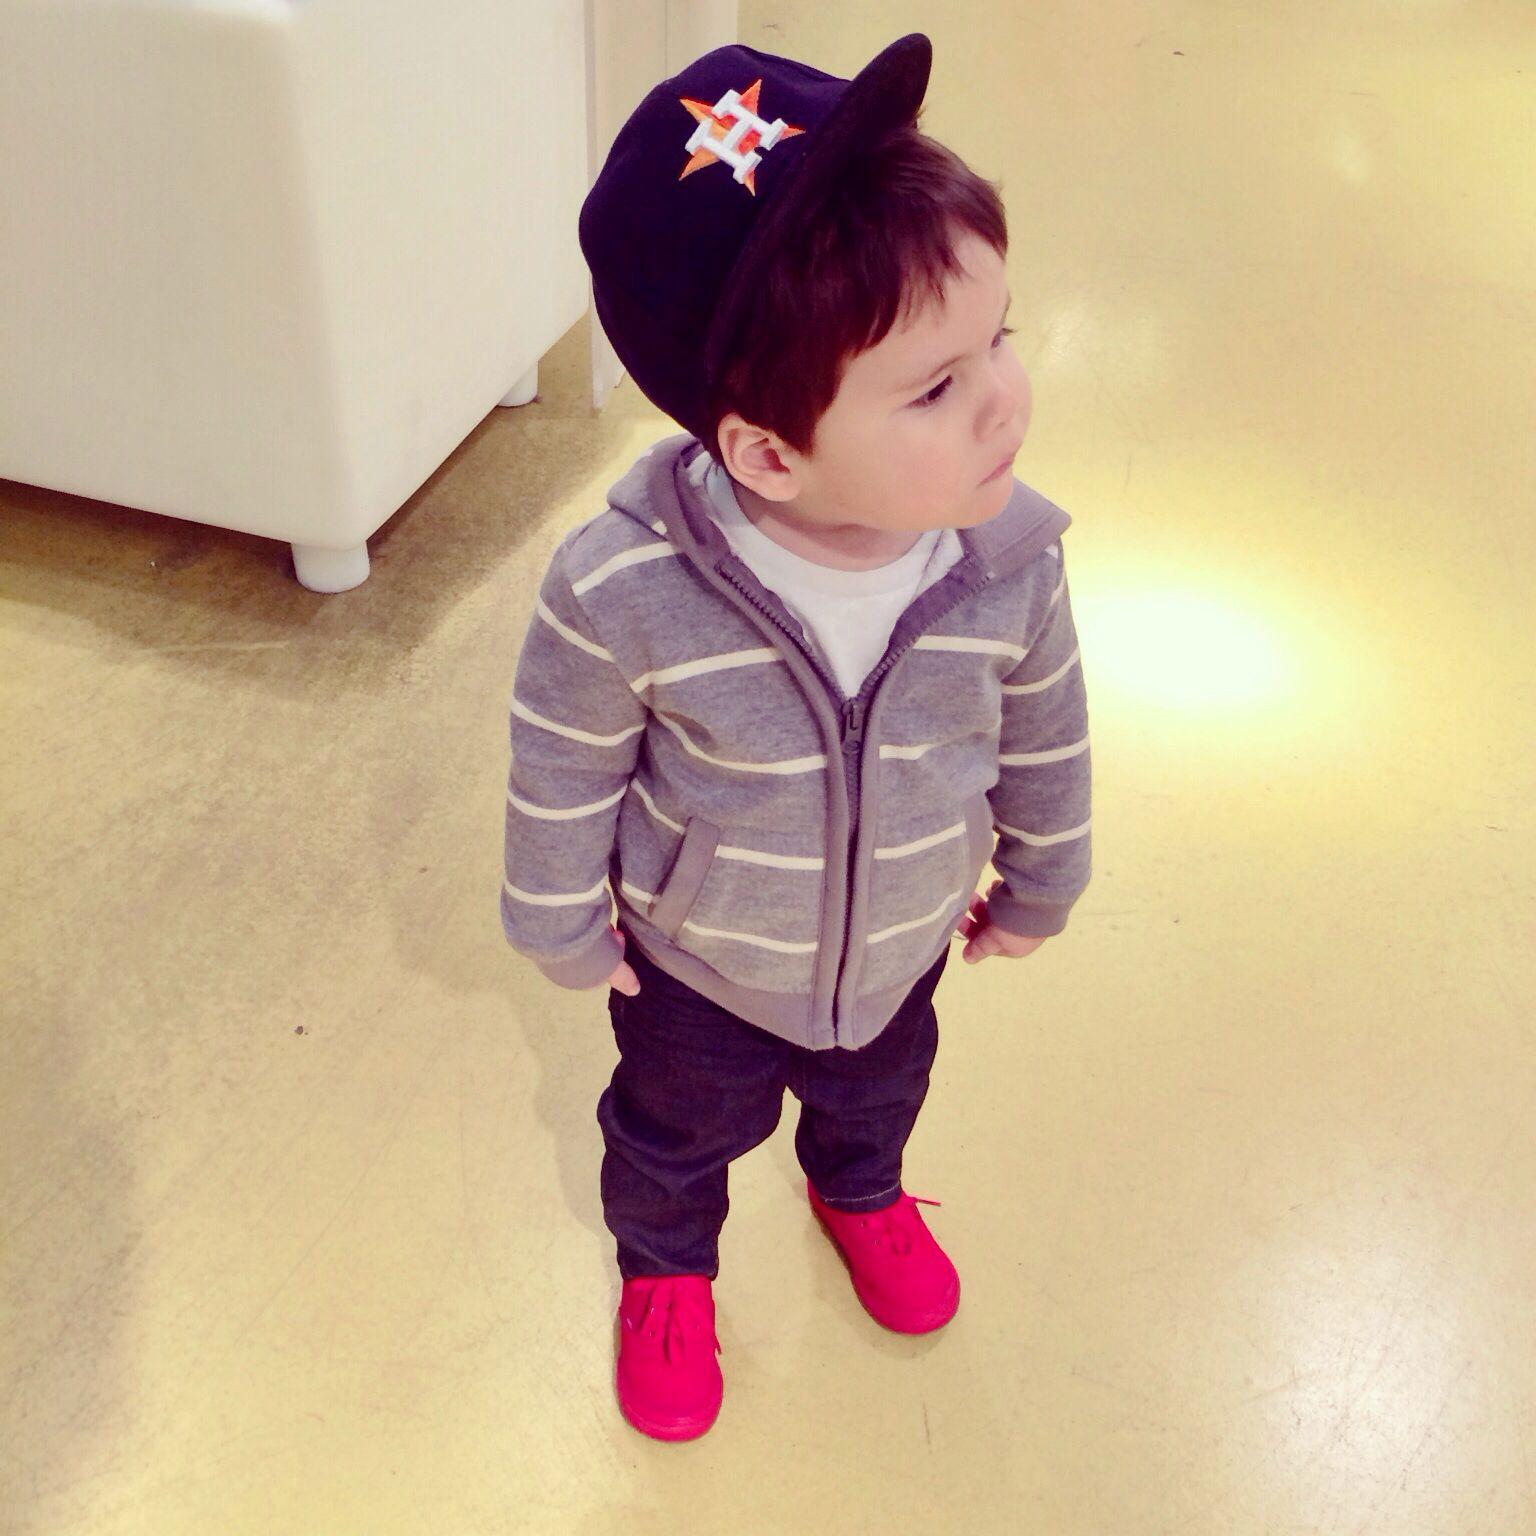 Casual Toddler Boy Outfit. Plain White #Polo Cotton Tee. Skinny ...